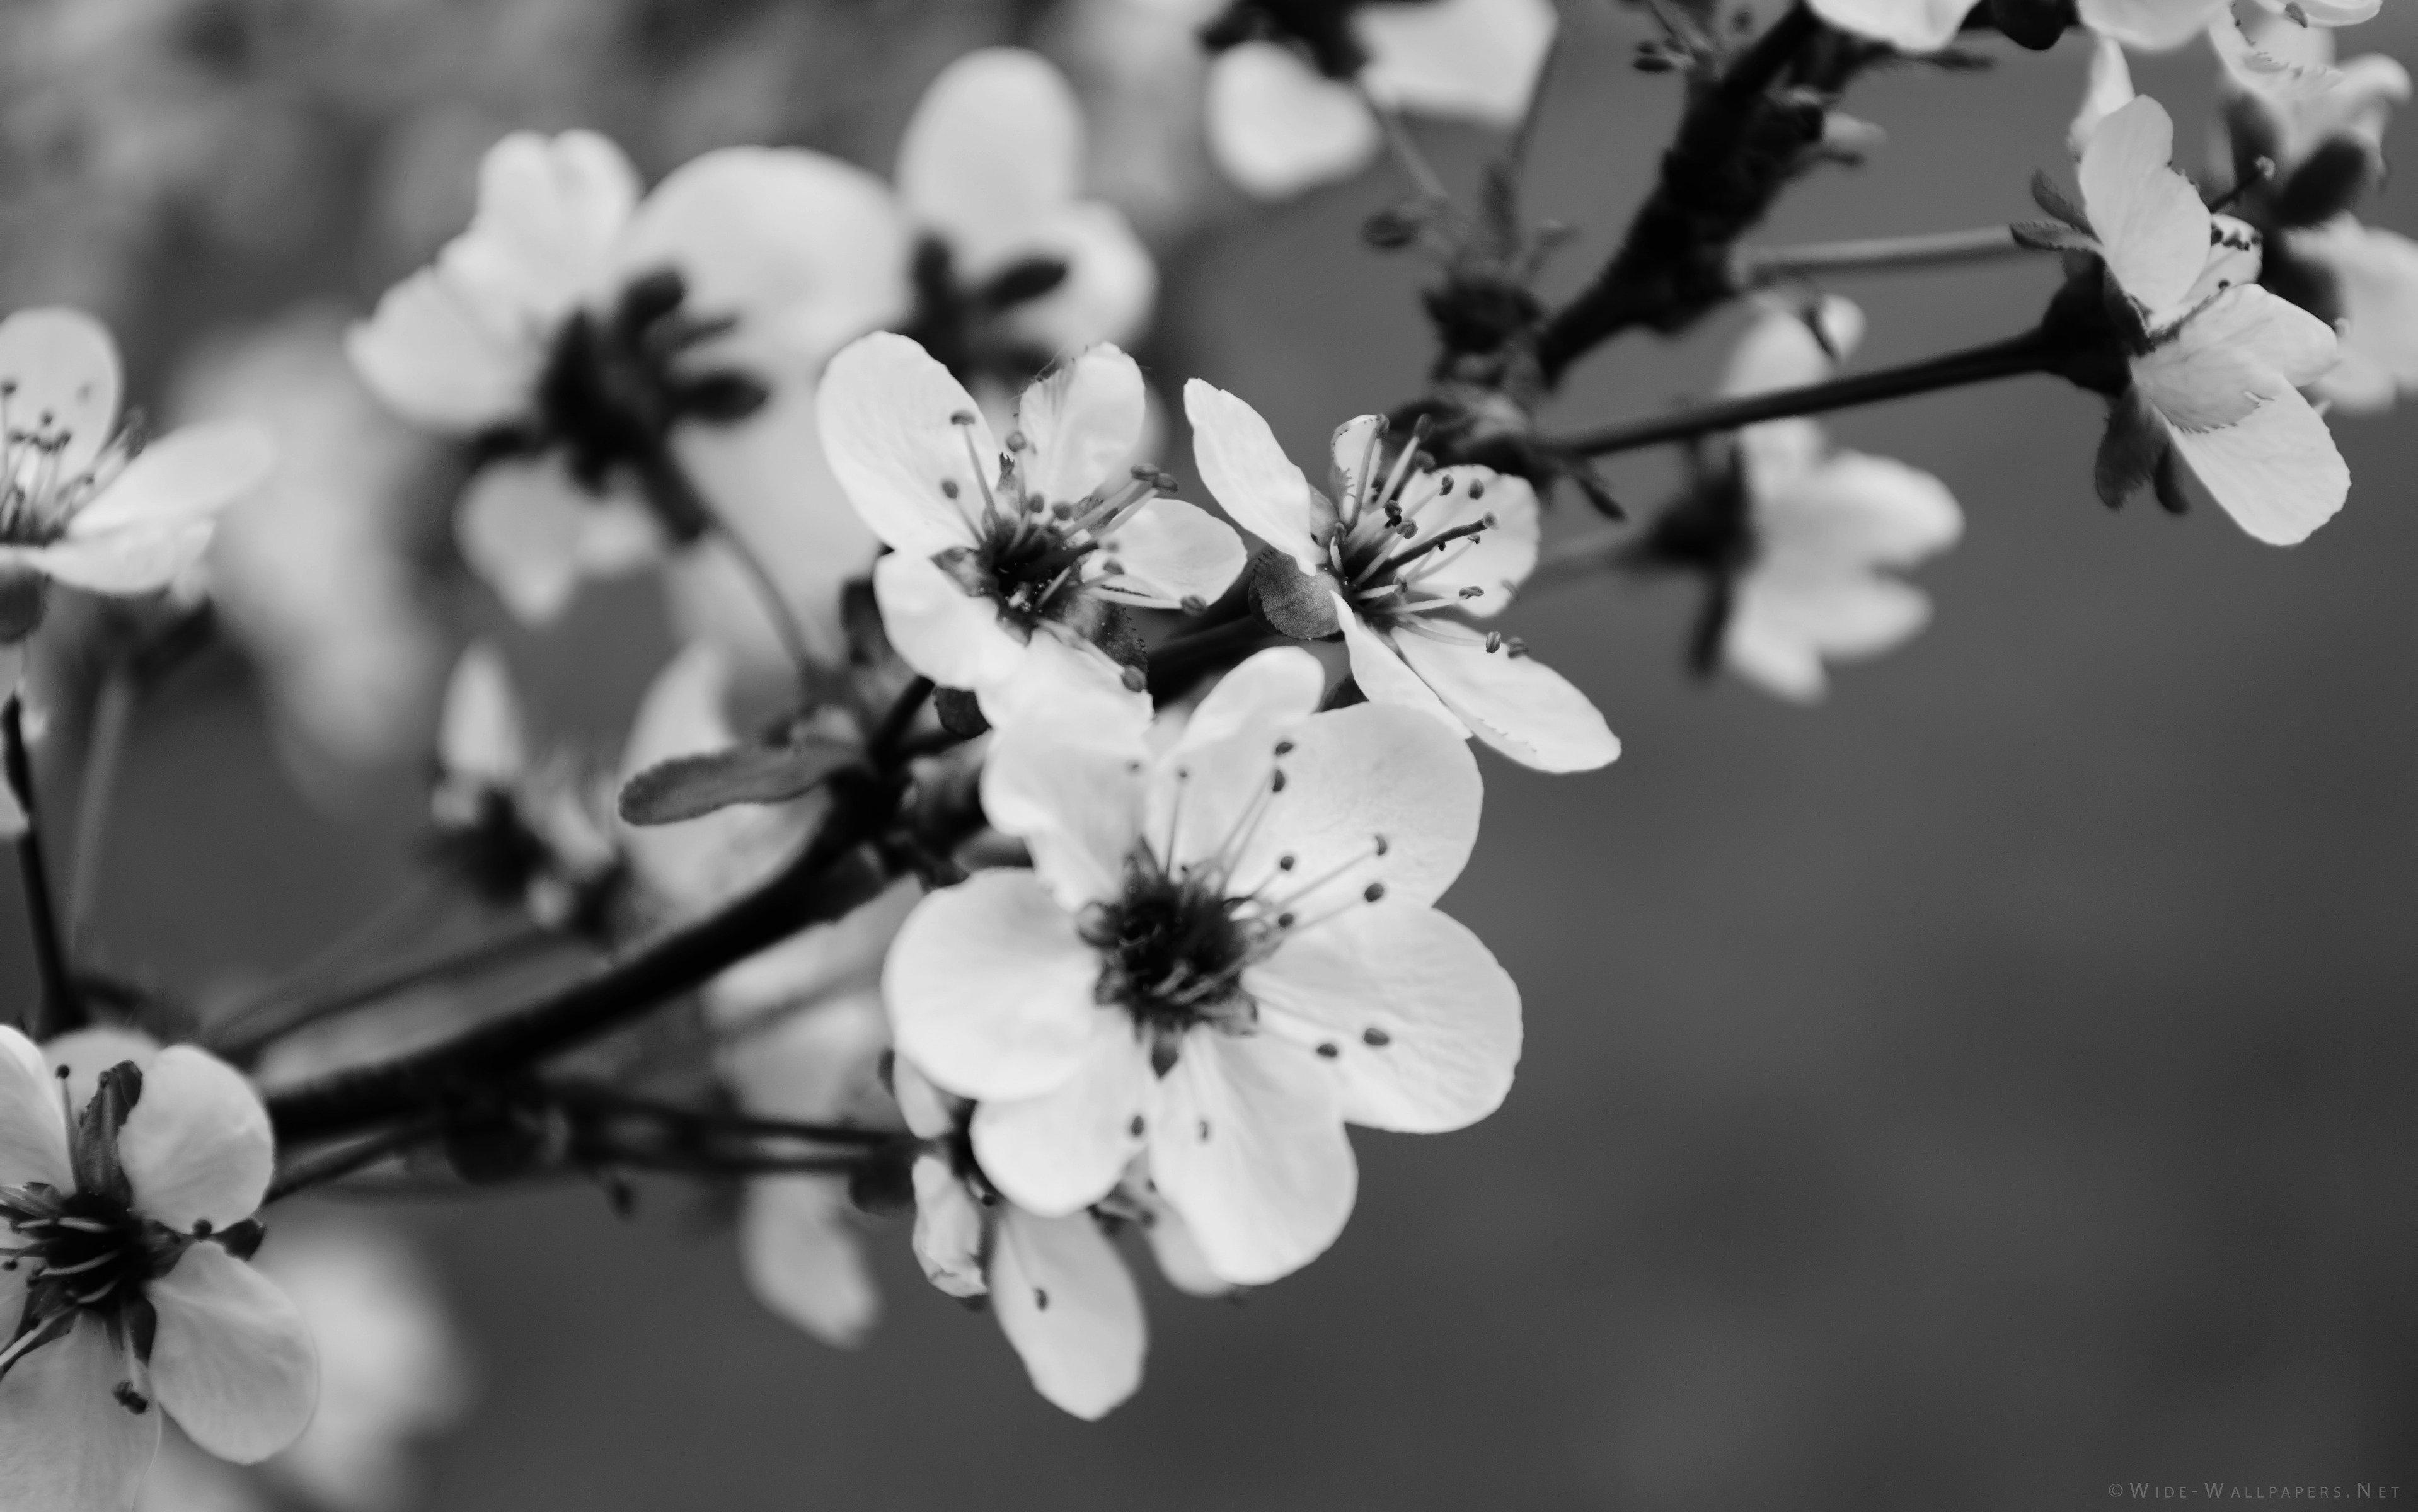 Black and white flower wallpaper 122 lyybj